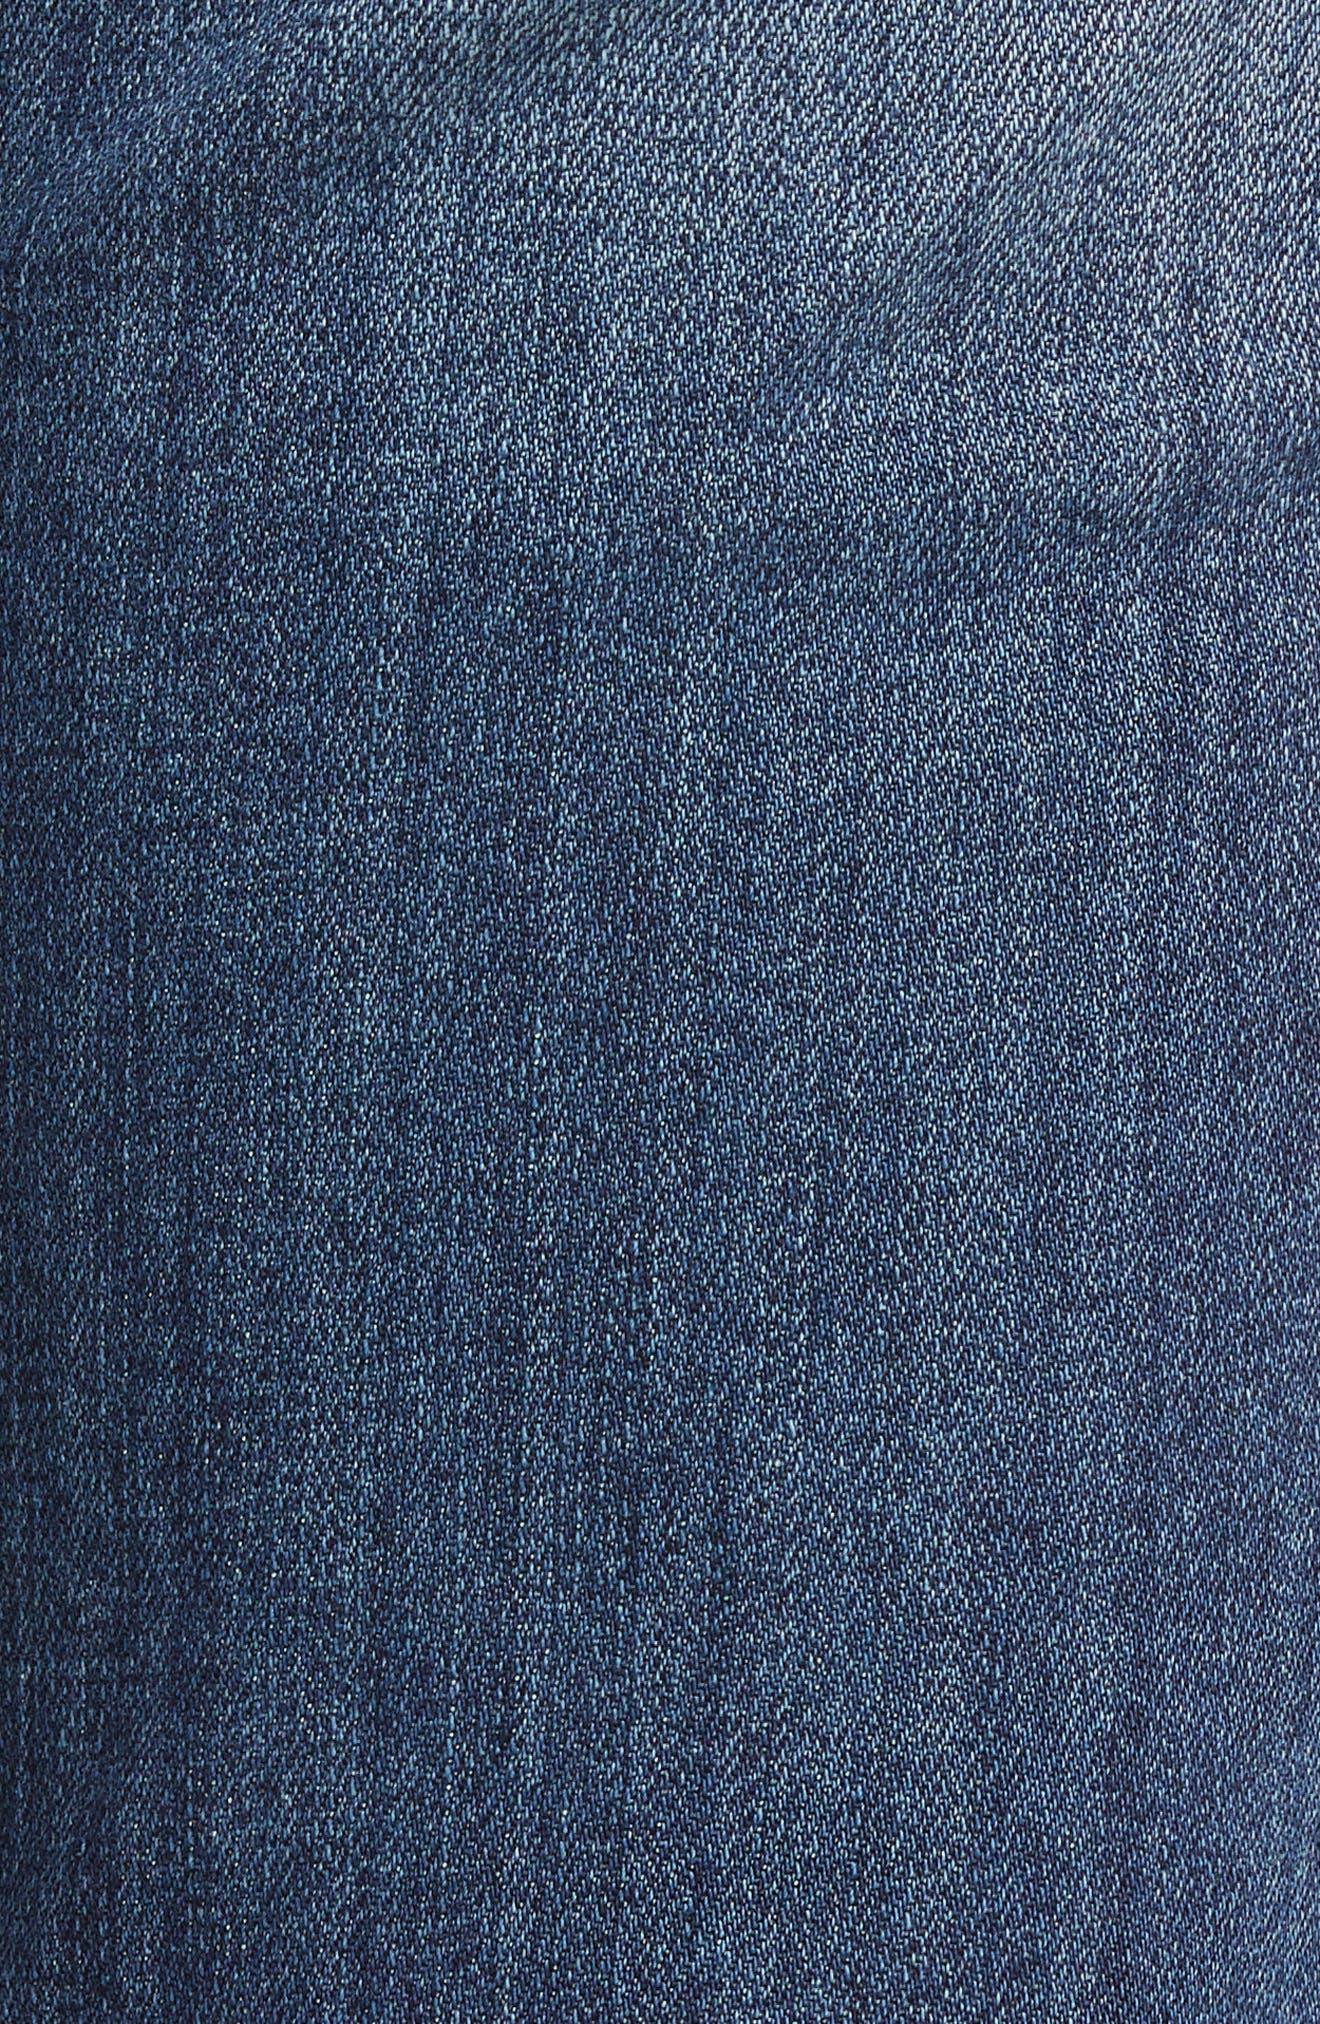 Catherine Boyfriend Jeans,                             Alternate thumbnail 5, color,                             415